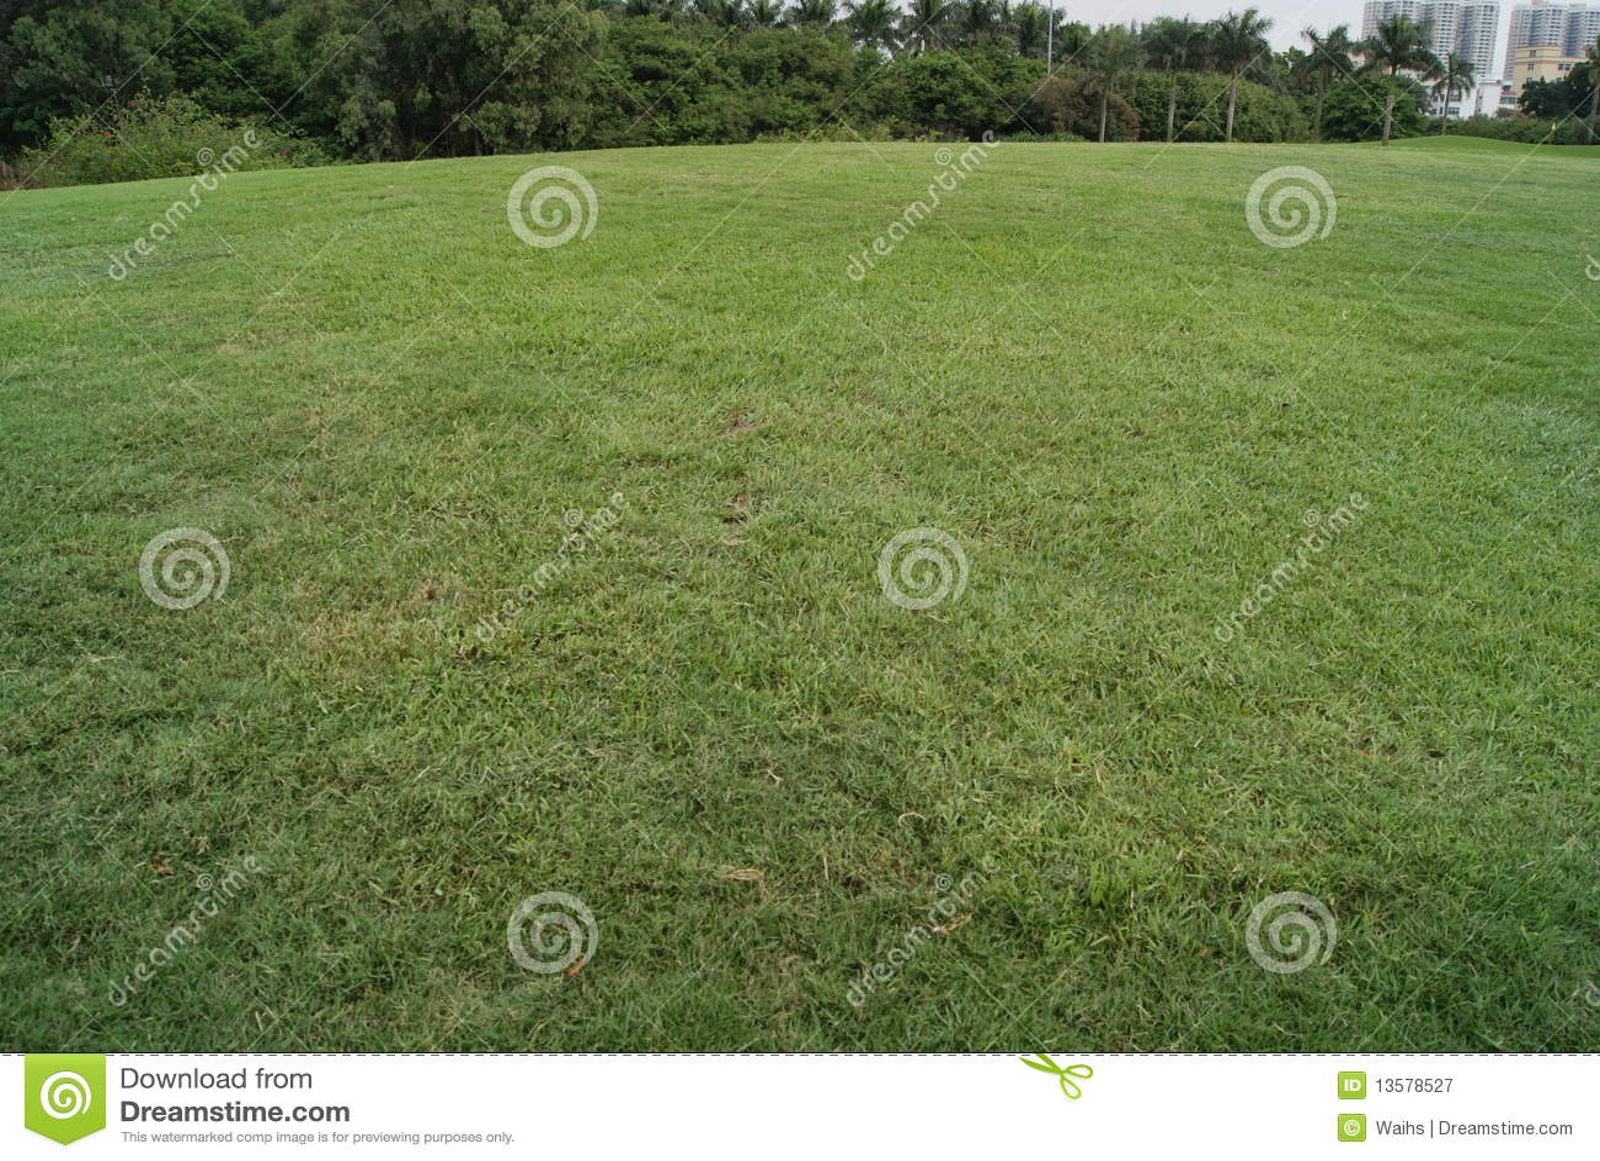 Bred lawn